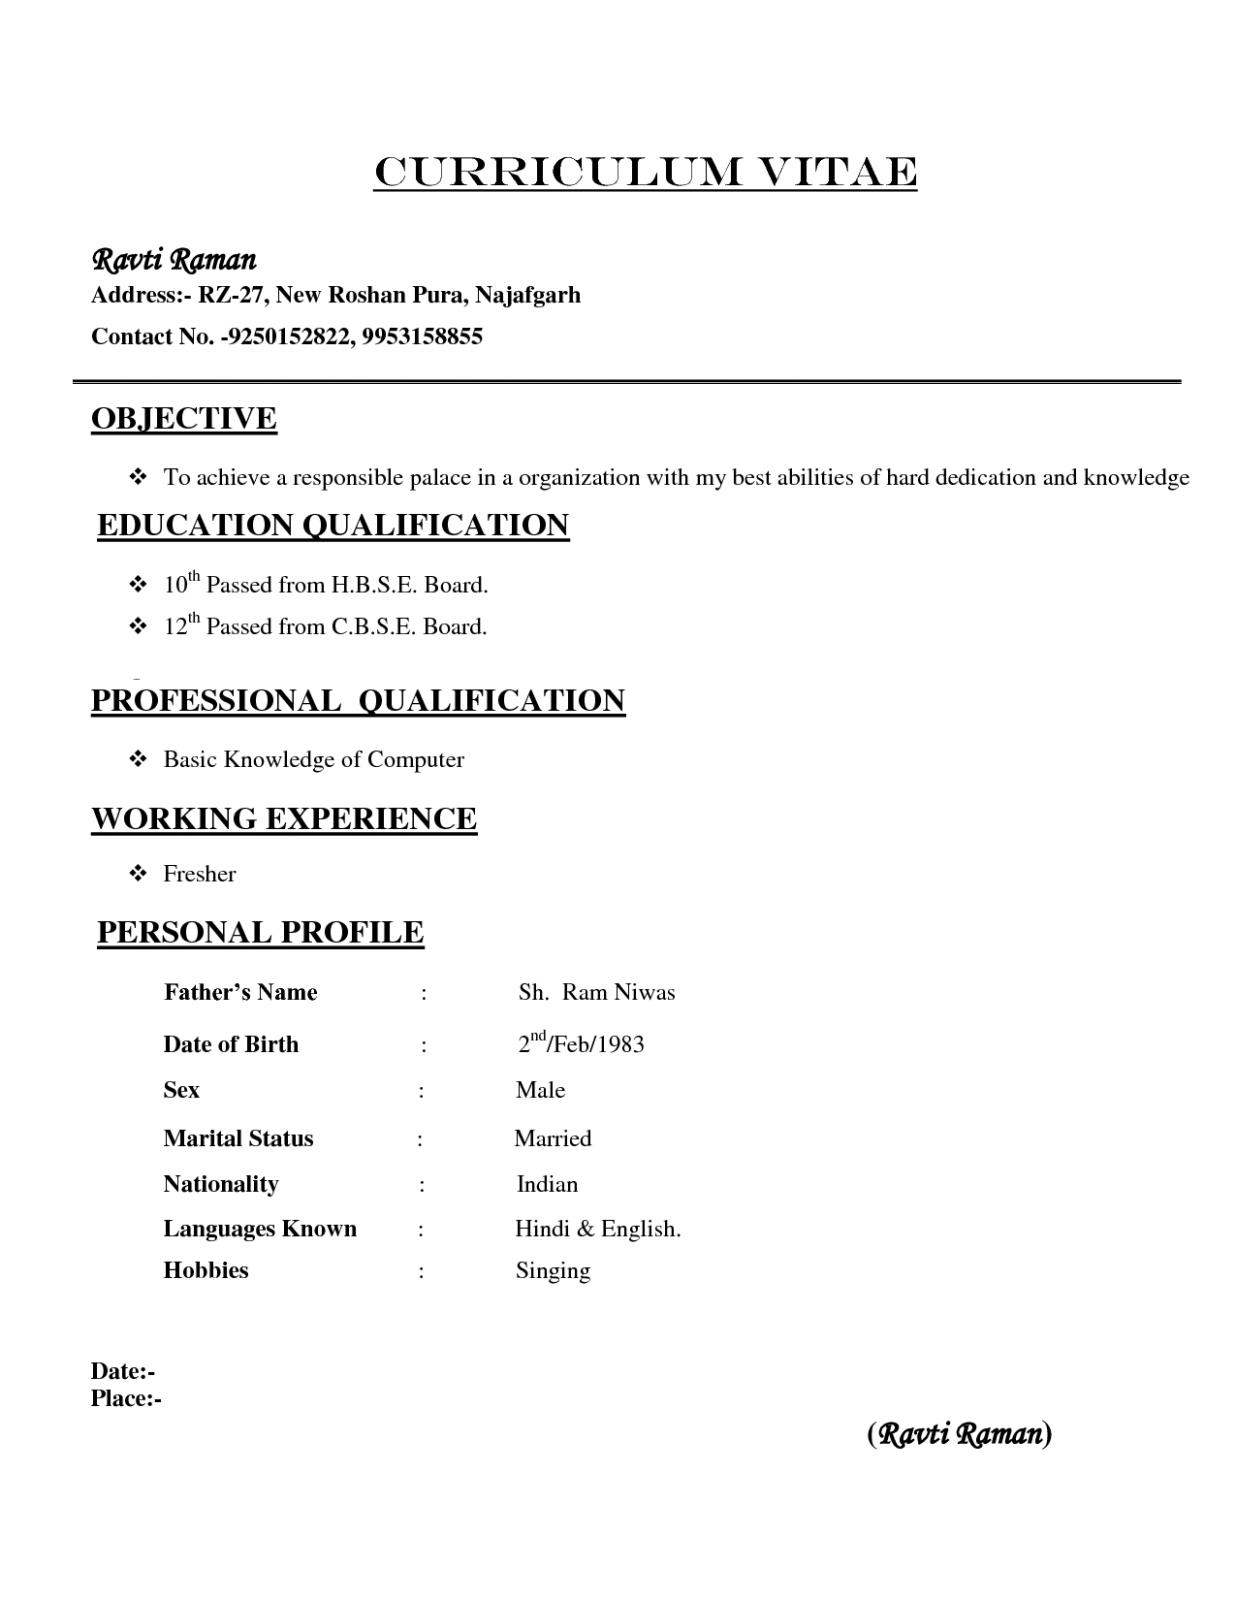 13 Main Trainer Resume Format In Phrase di 2020